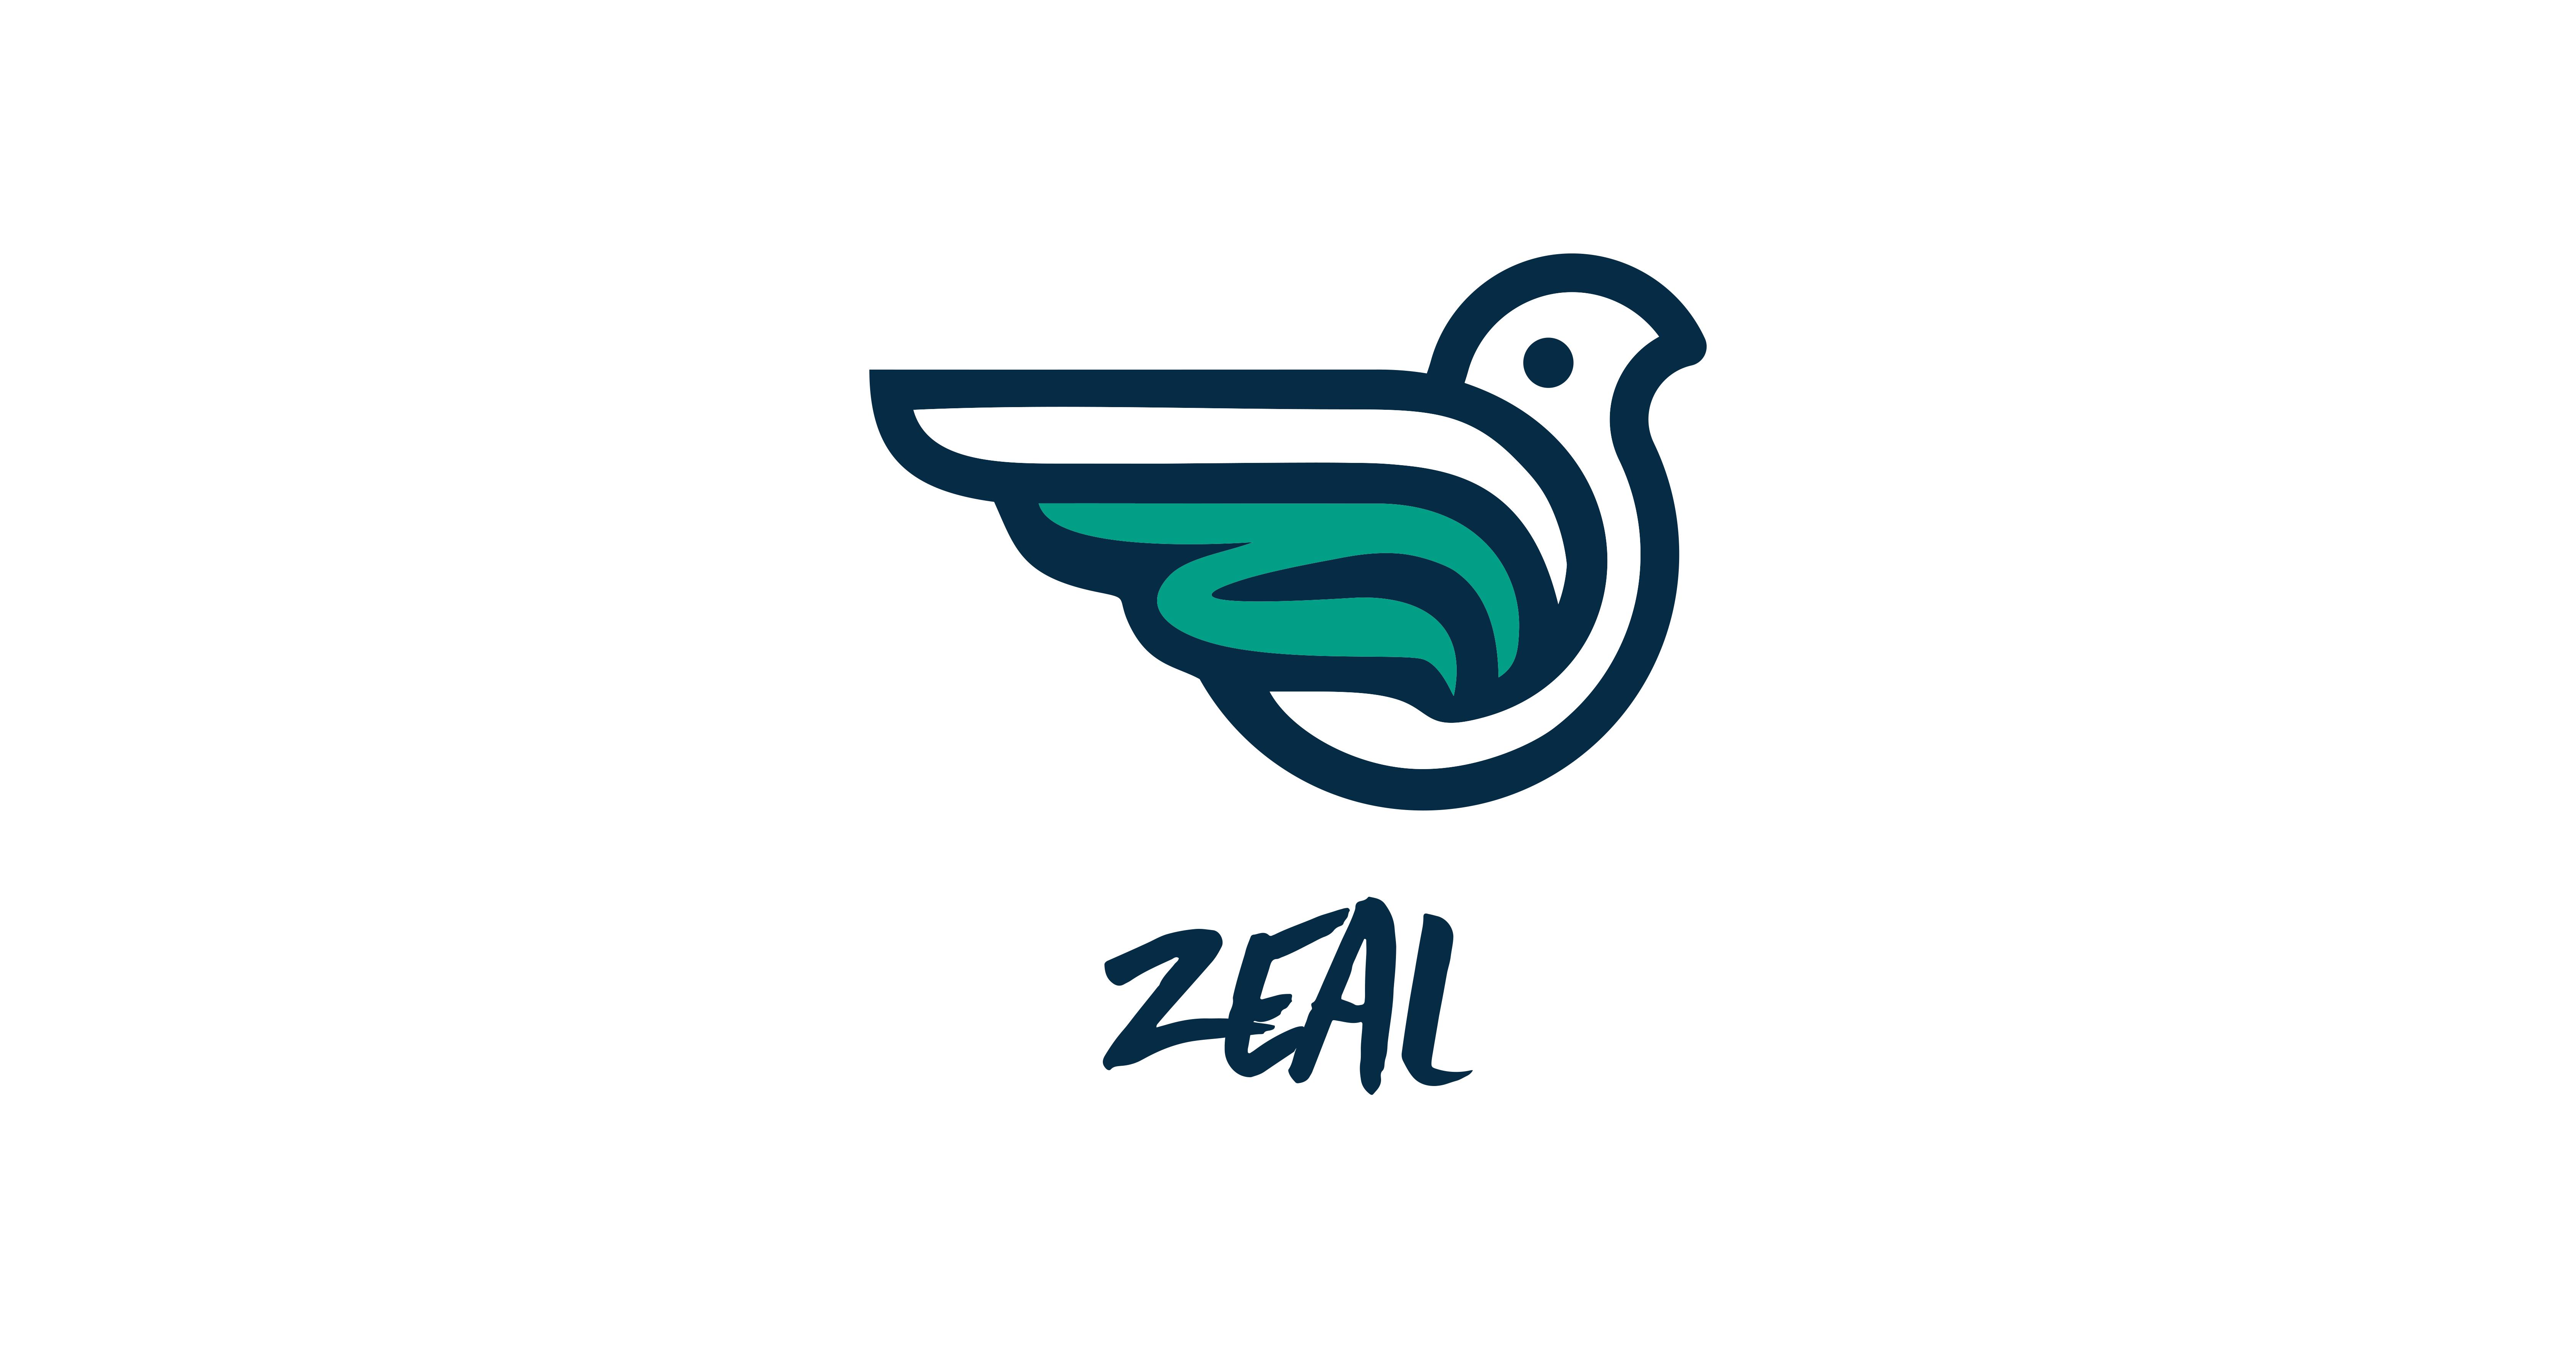 Job: Web Developer at Zeal Rewards in Cairo, Egypt